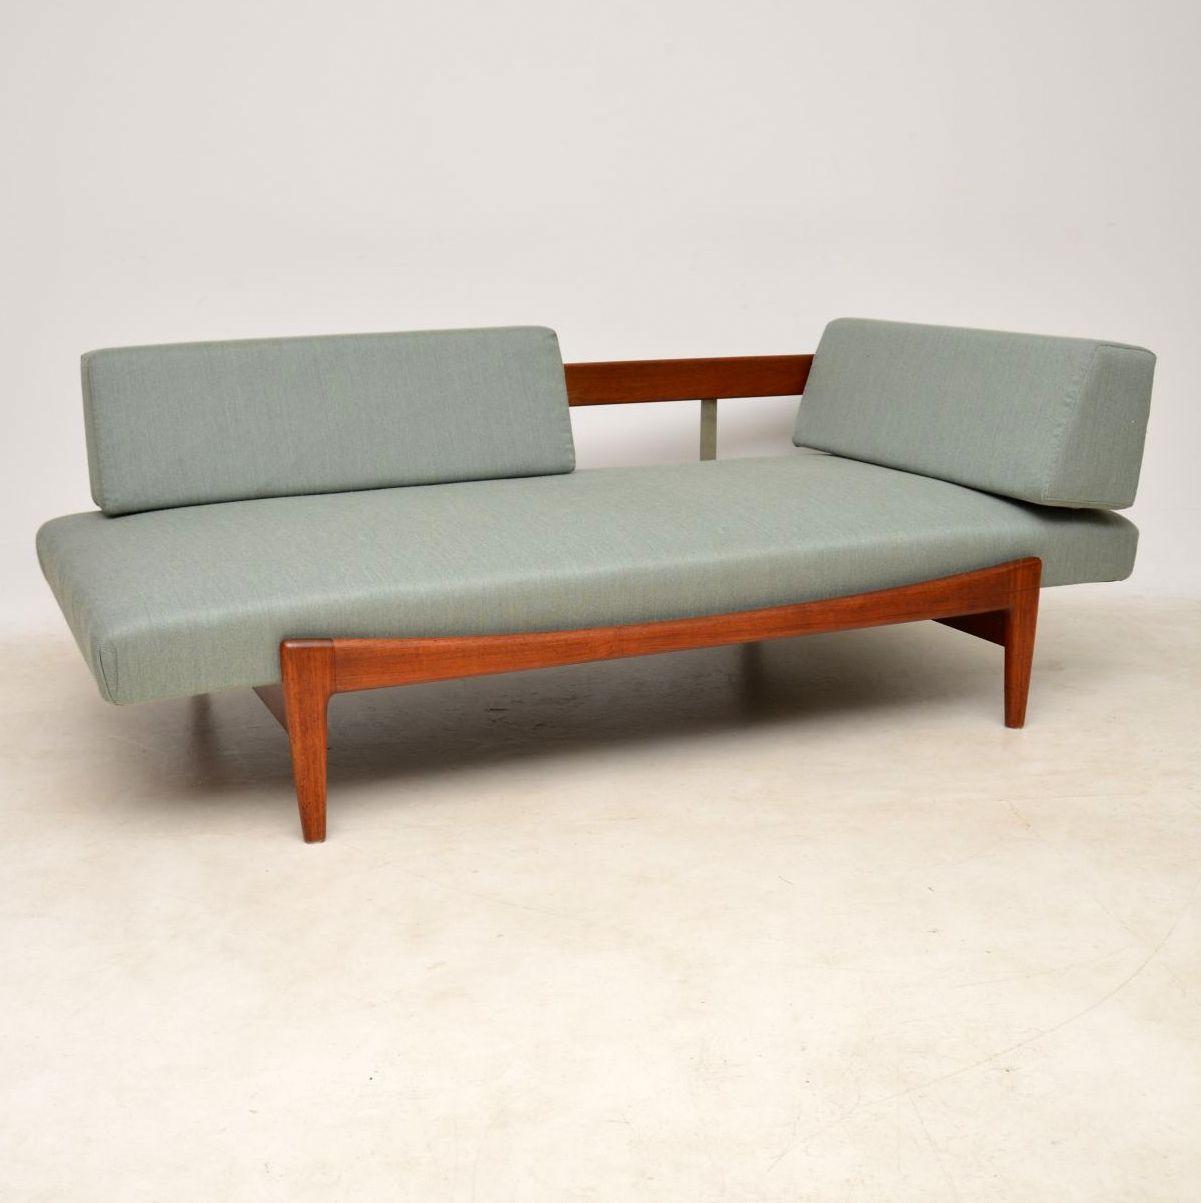 1960 S Vintage Danish Teak Daybed Sofa By Ib Kofod Ln